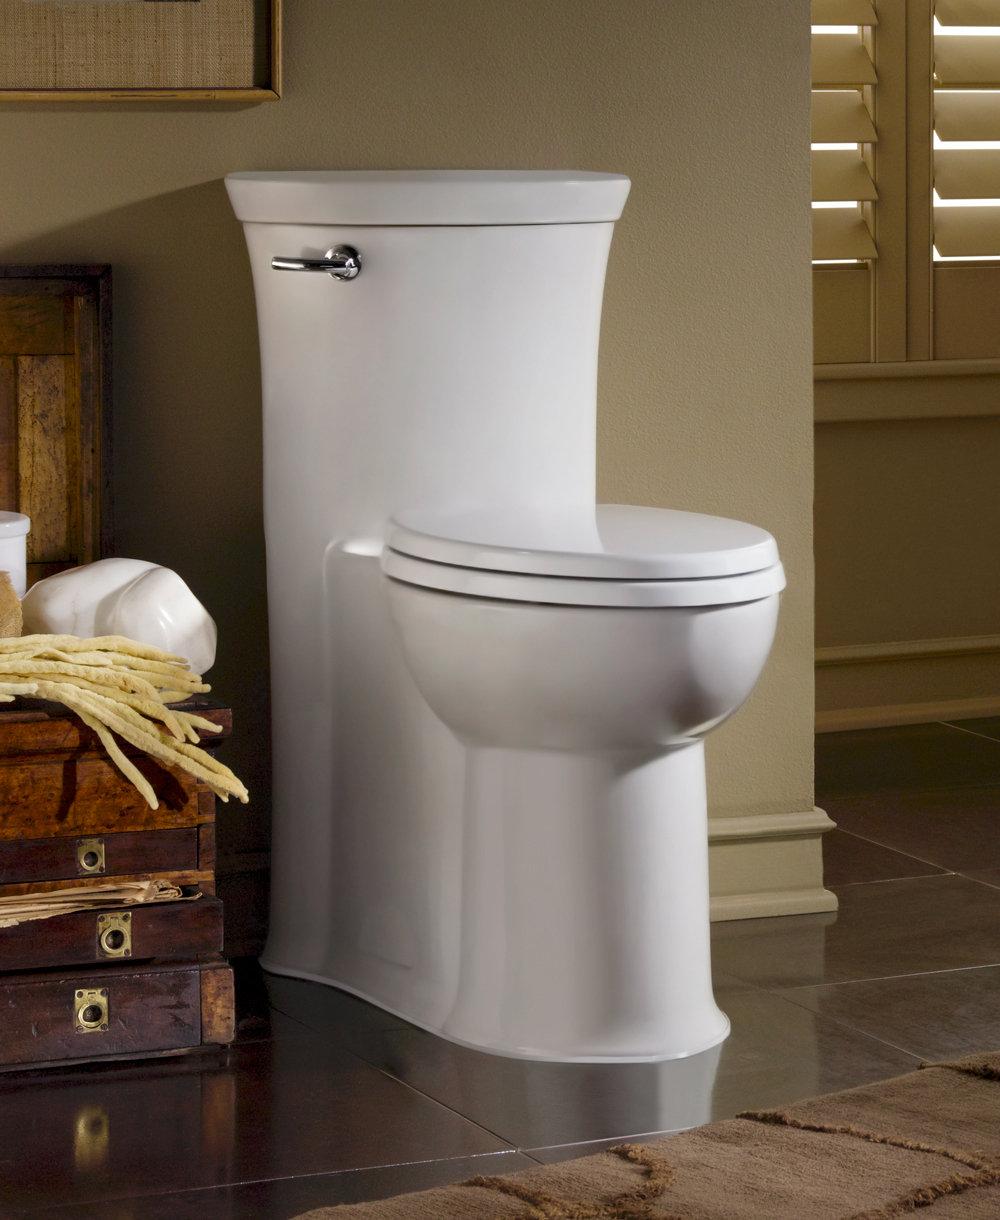 American Standard Toilets : American Standard 2786.128.020 Tropic RH Elongated One Piece Flowise ...